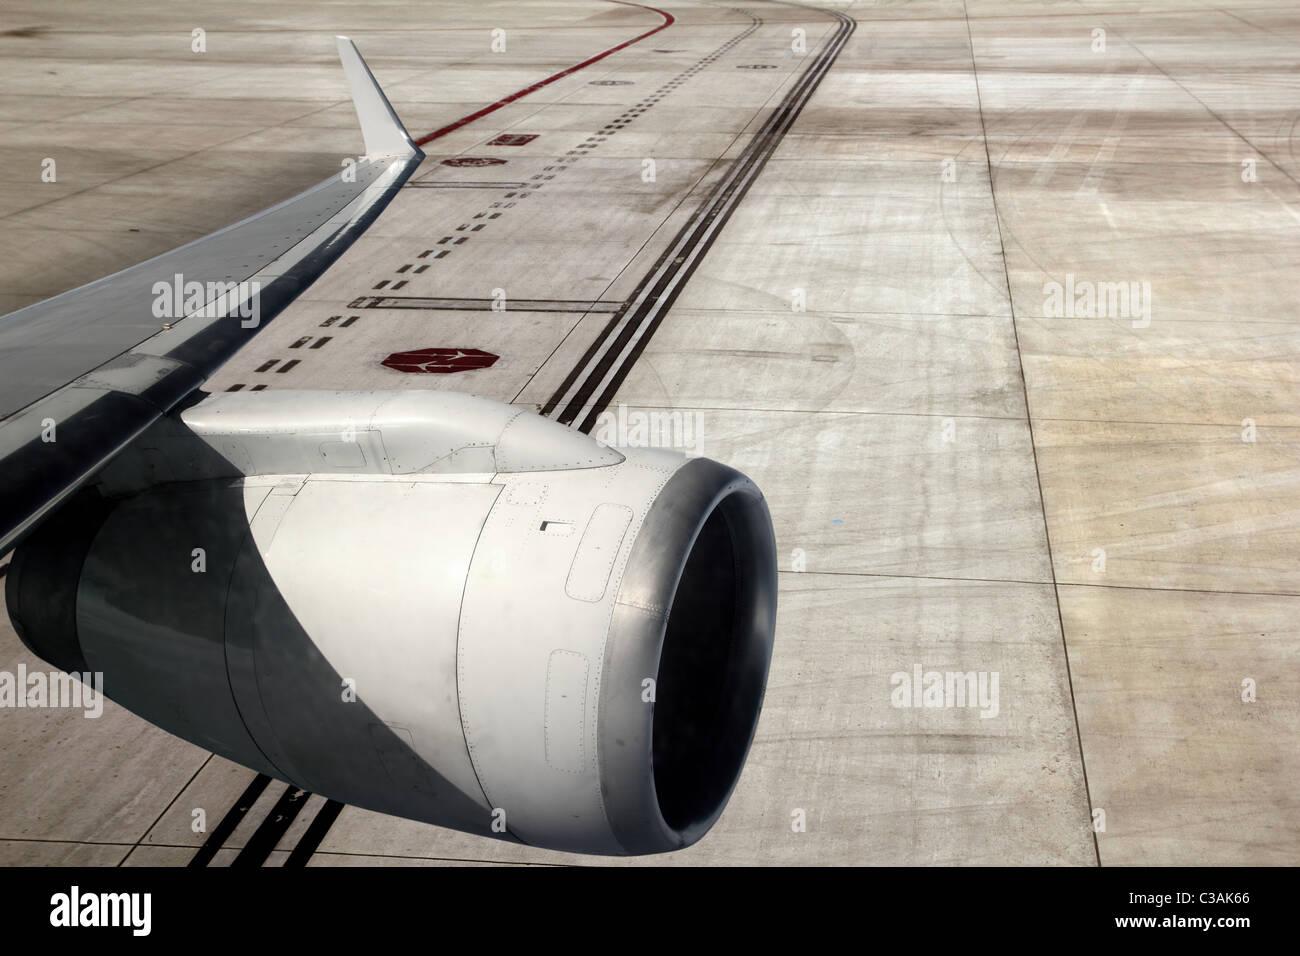 airplane wing aircraft turbine landing on runway road - Stock Image